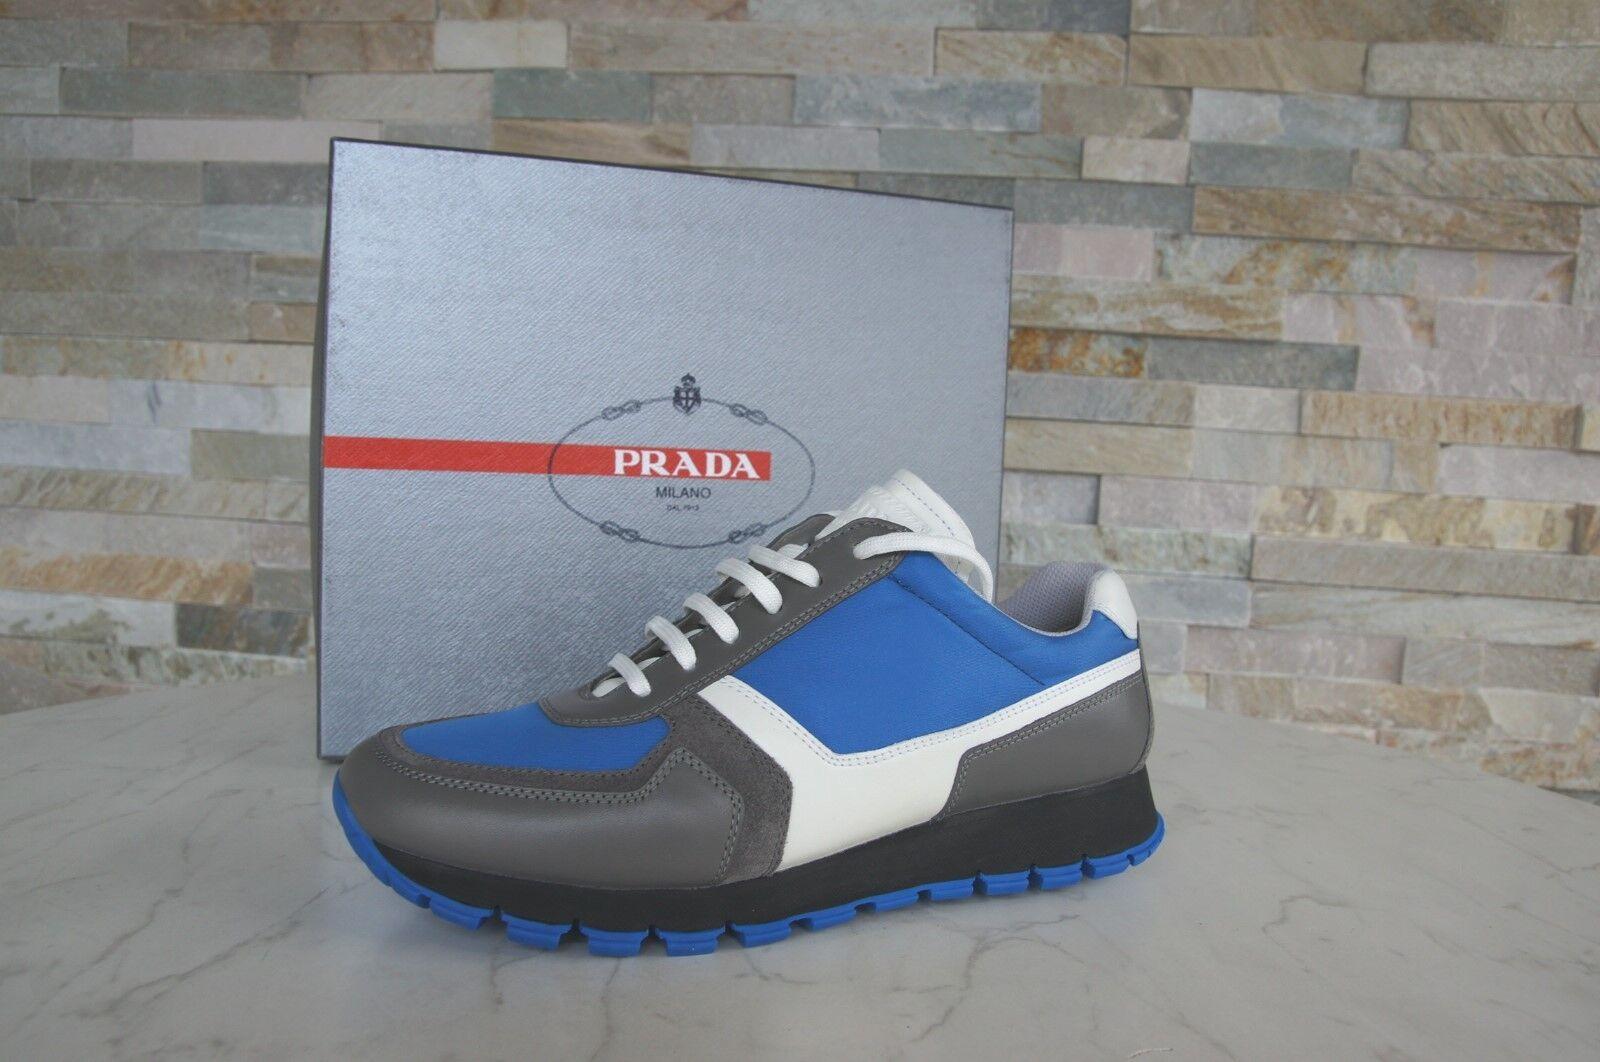 PRADA SNEAKERS n. 39 Scarpe Basse normalissime scarpe shoes grigio-blu NUOVO UVP